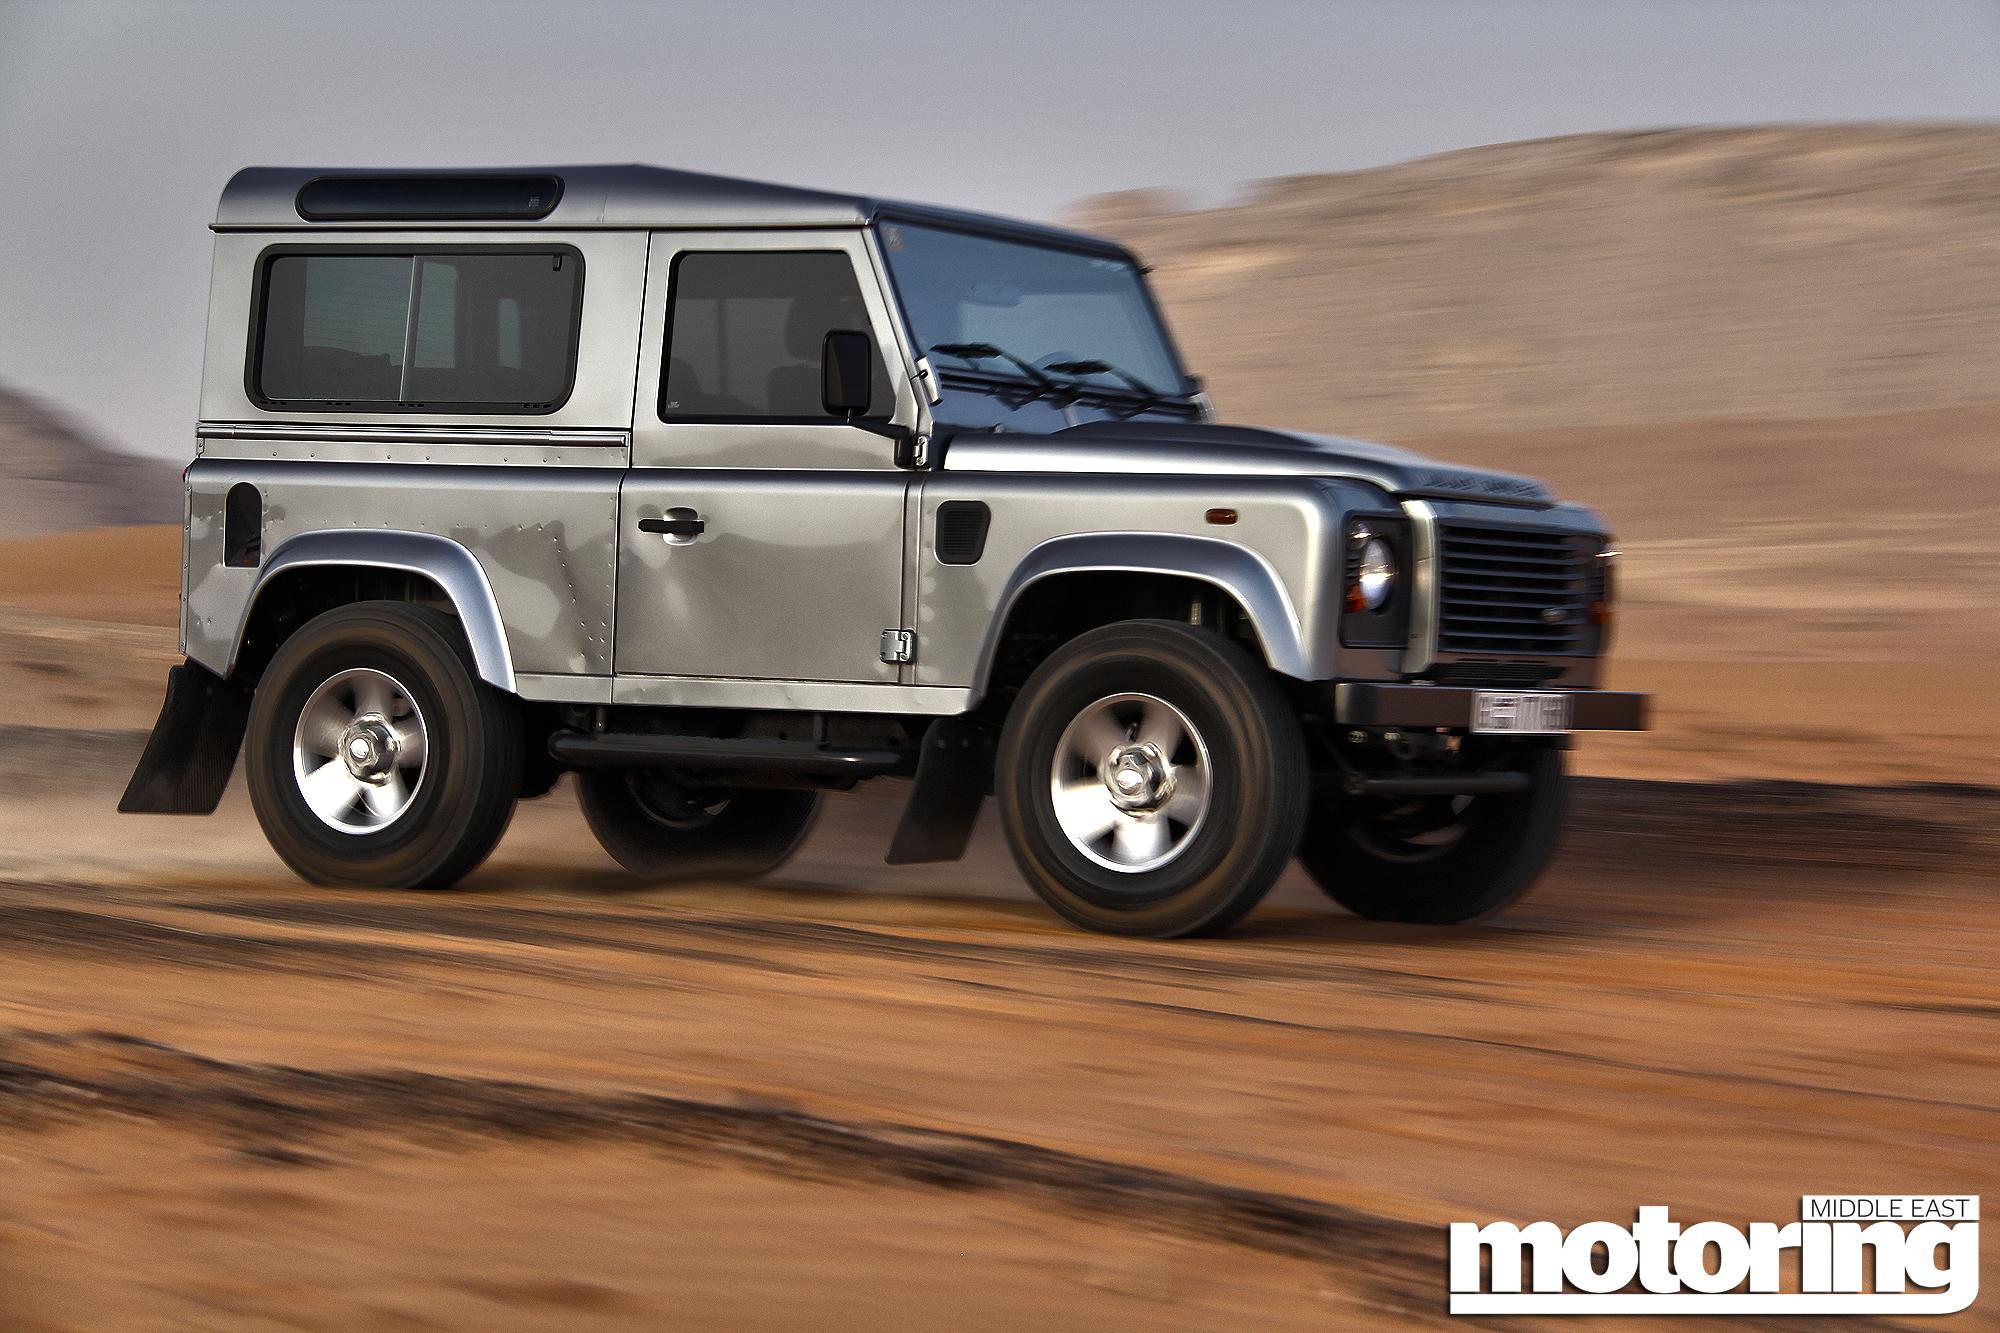 http://www.motoringme.com/wp-content/uploads/2013/09/Land-Rover-Defender-90-02.jpg